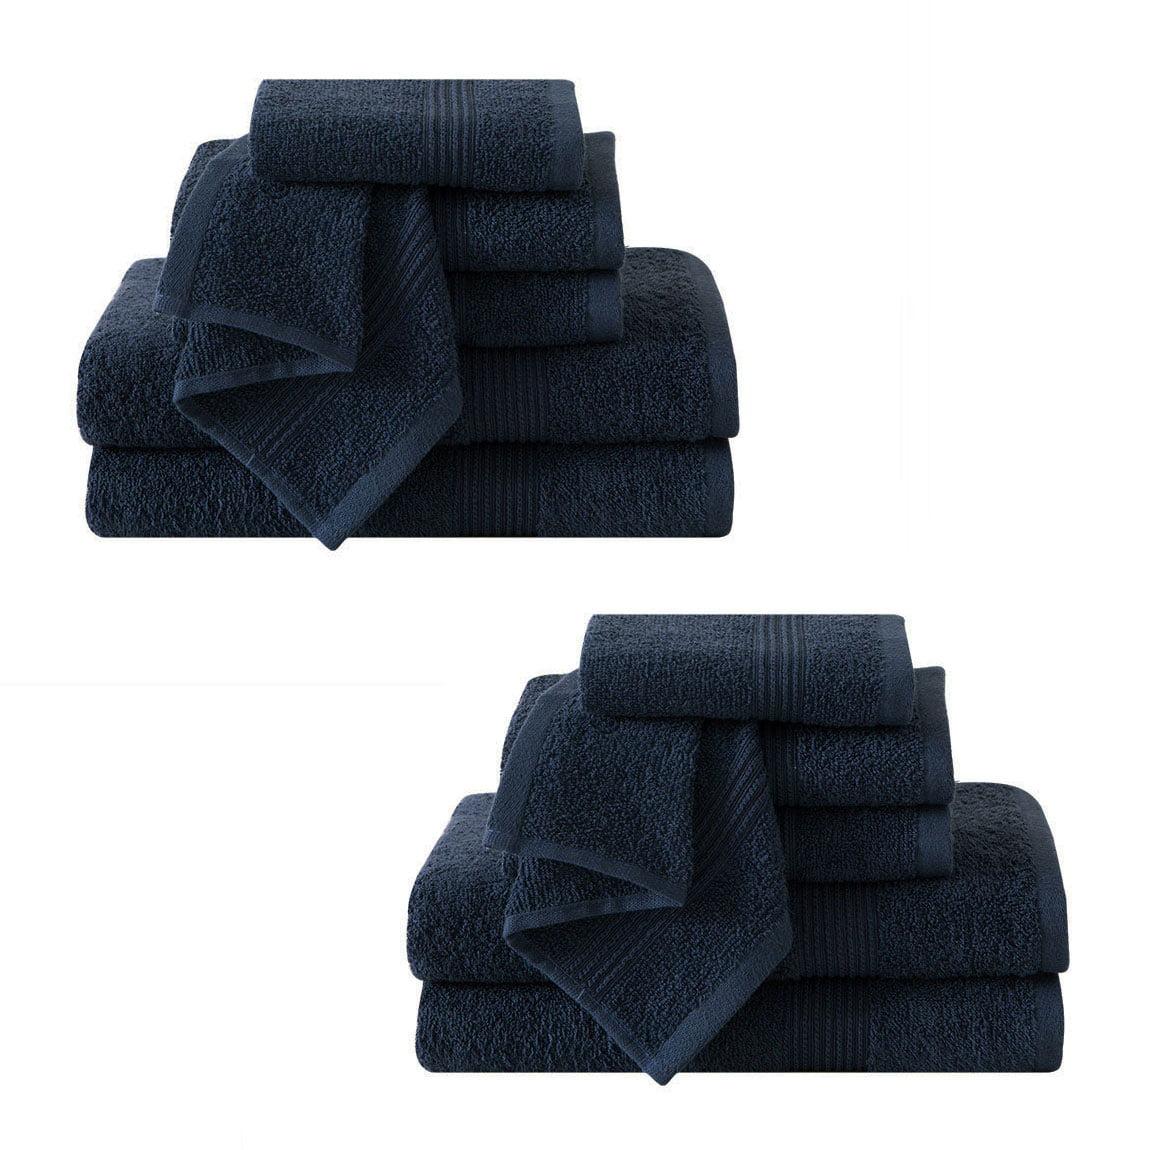 Ribbed Luxury Bath Towel 12 Piece Set 100% Cotton, Navy Blue (4...